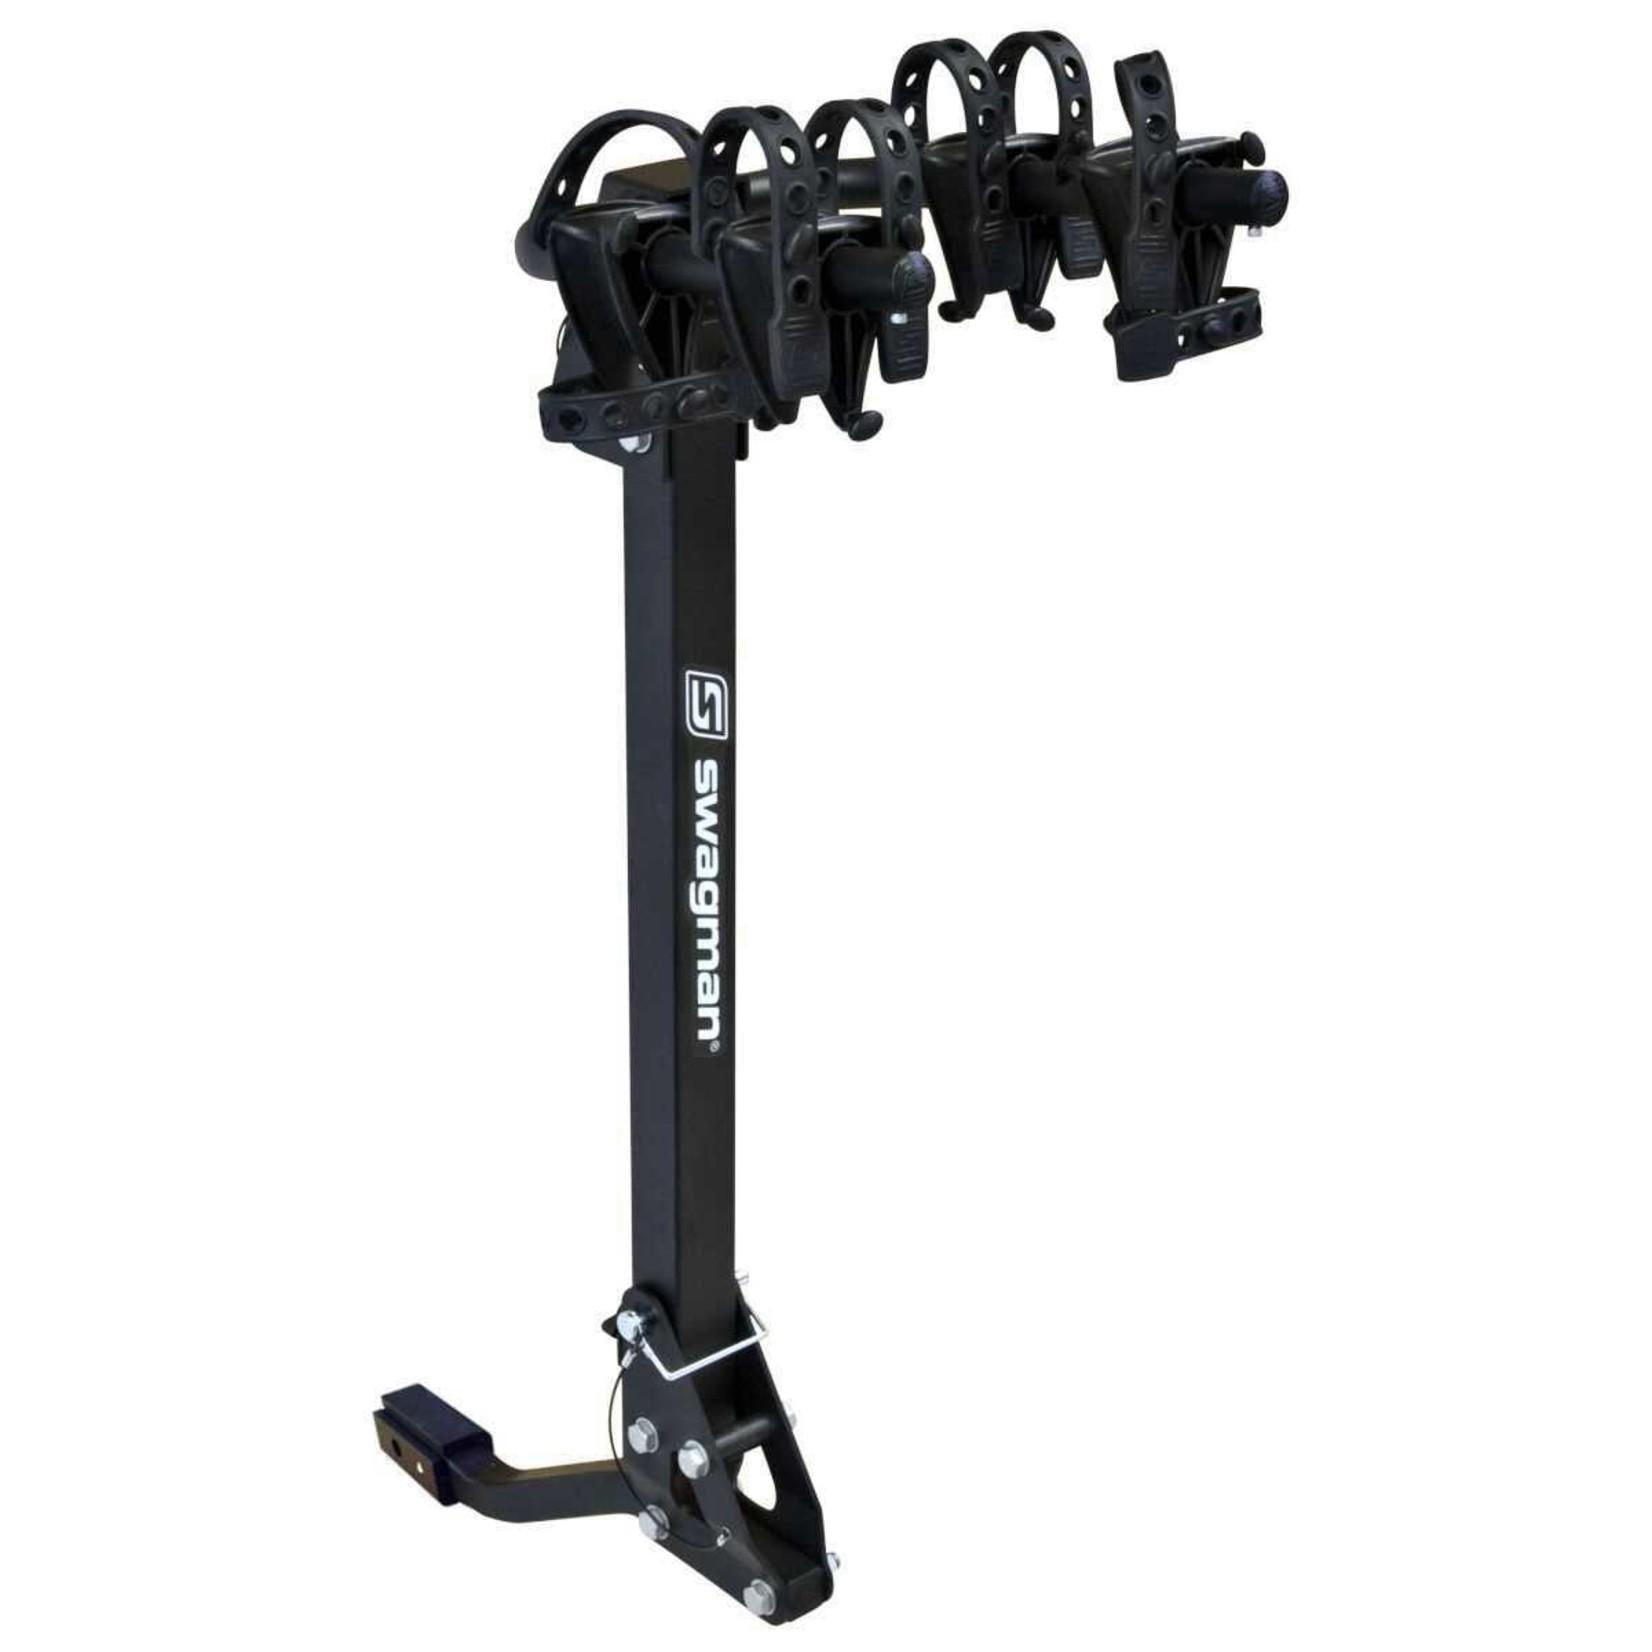 Swagman Swagman Bike Rack, Trailhead 2 Folddown